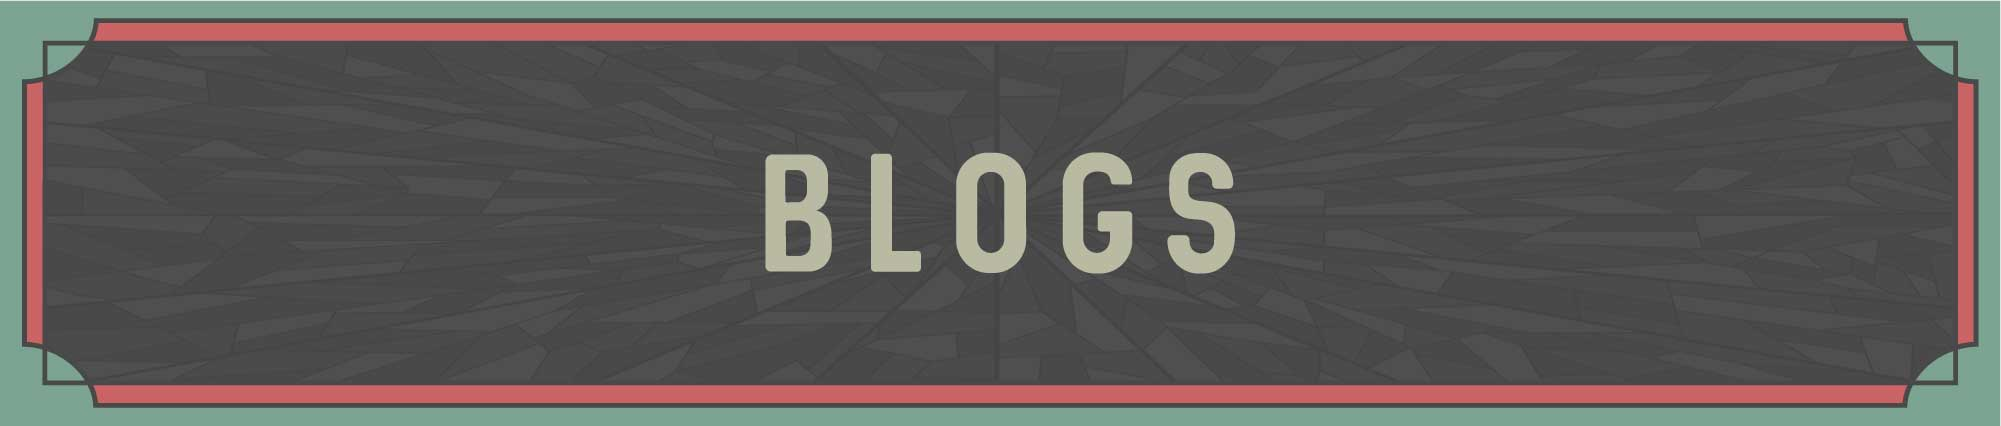 IAM_Blogs.jpg